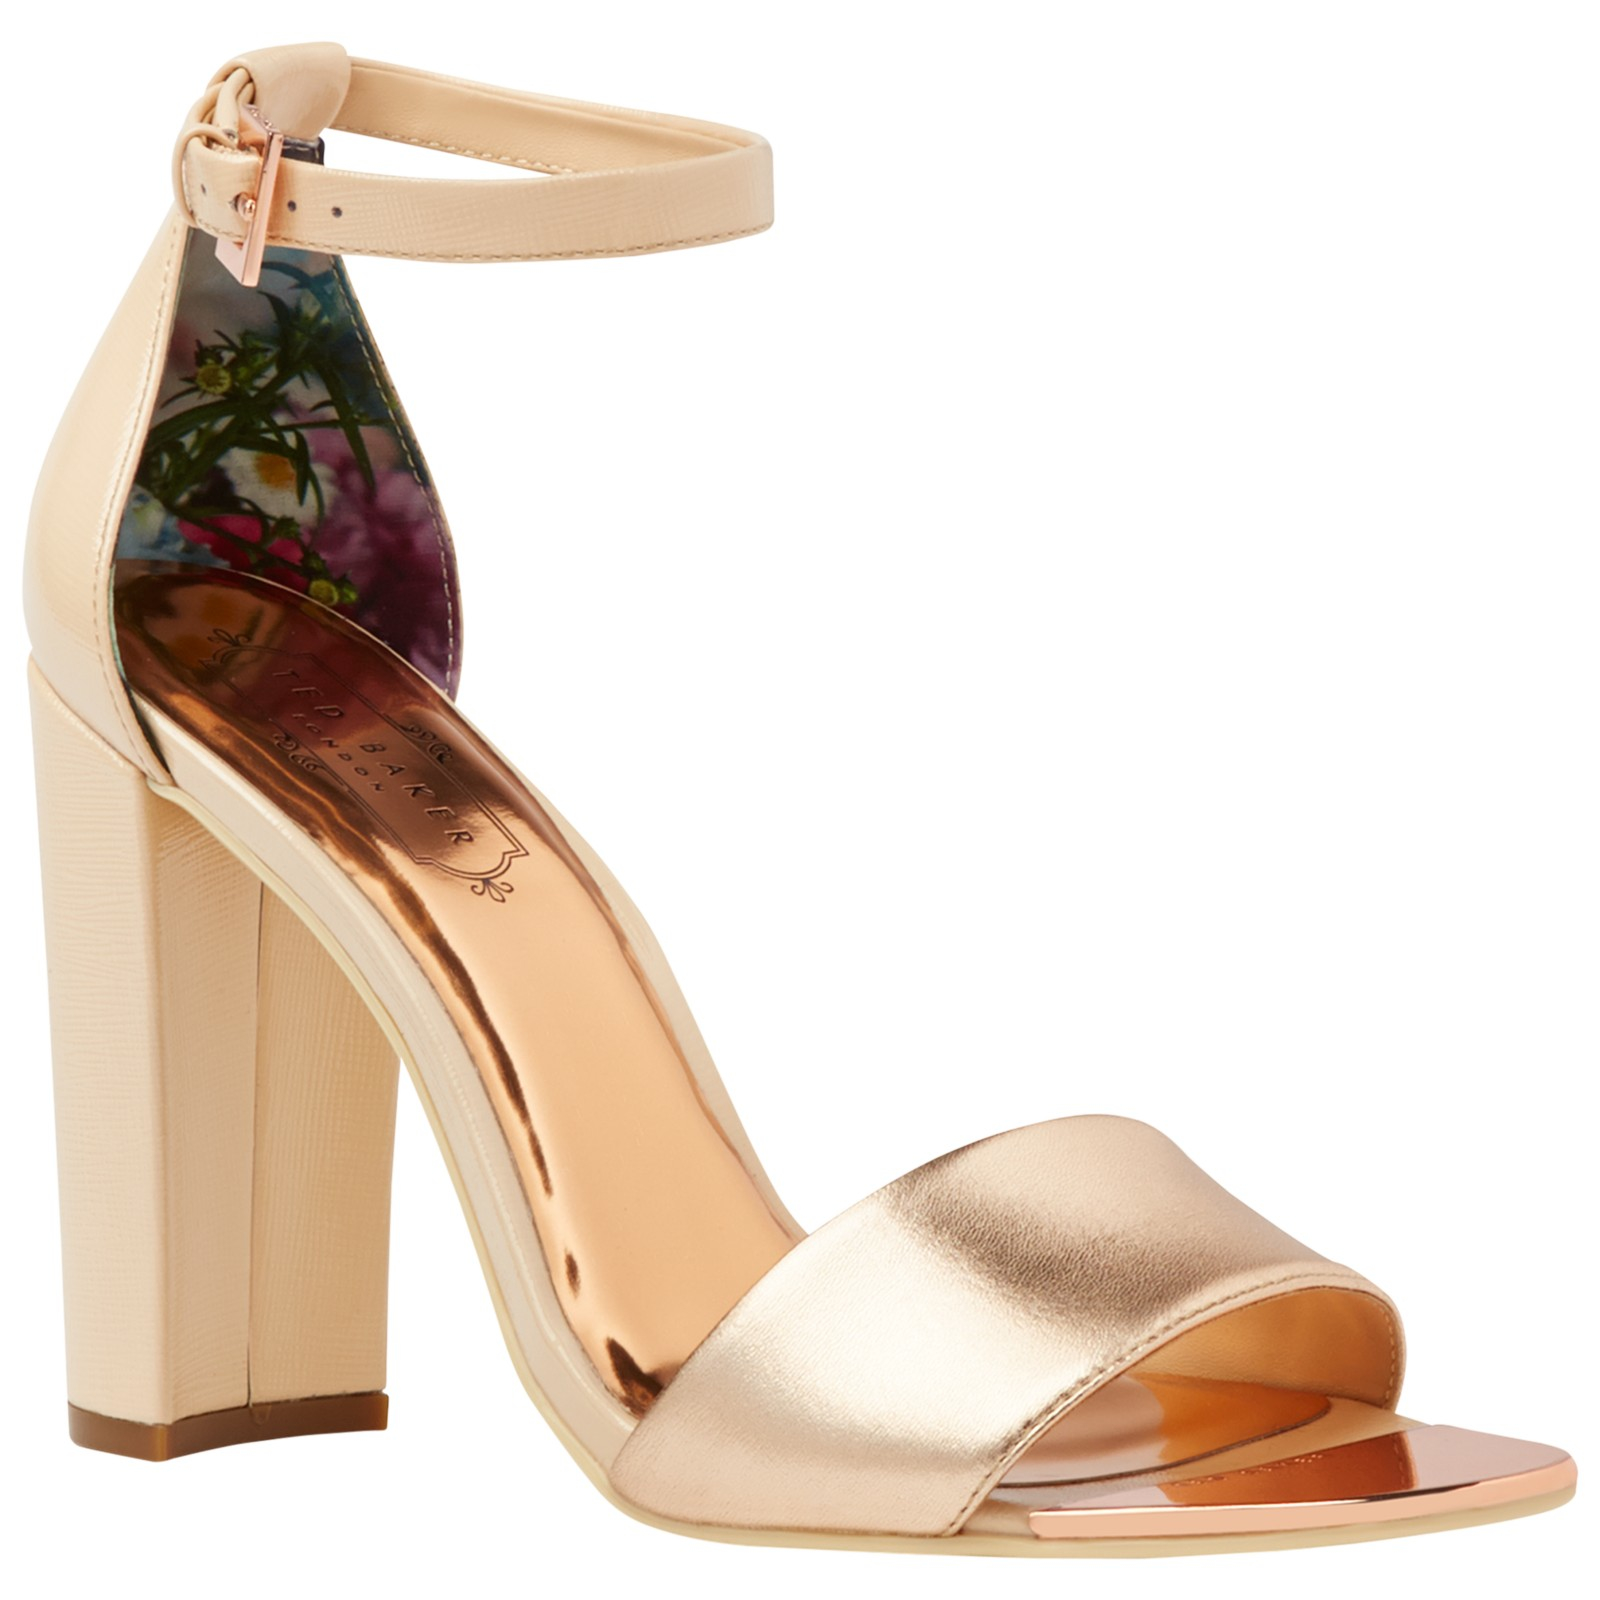 3064d36b2cb Ted Baker Caiye Block Heeled Sandals in Metallic - Lyst